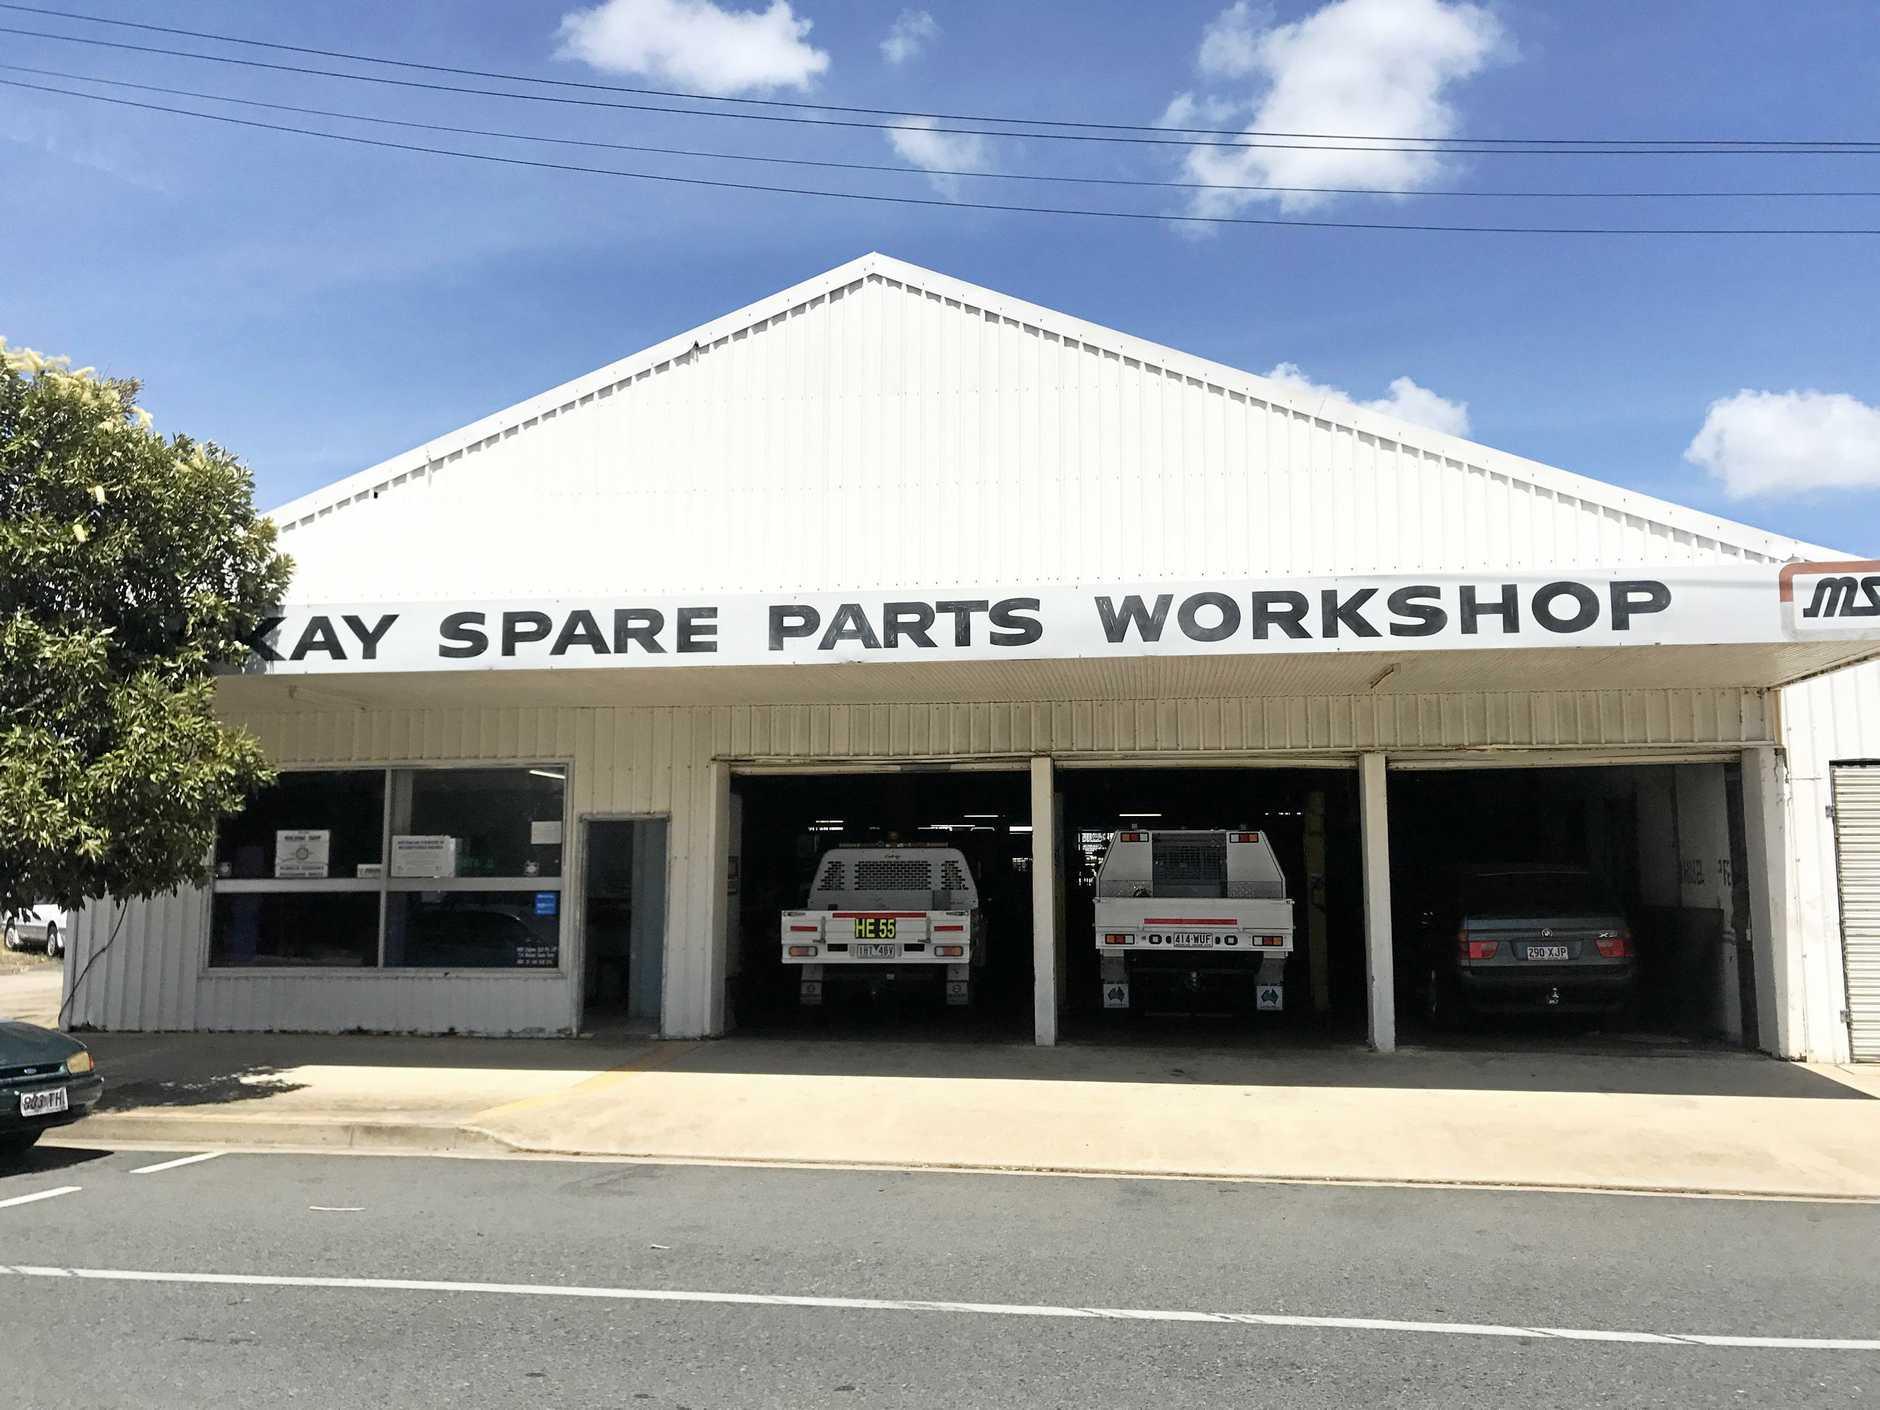 Mackay Spare Parts Workshop site.